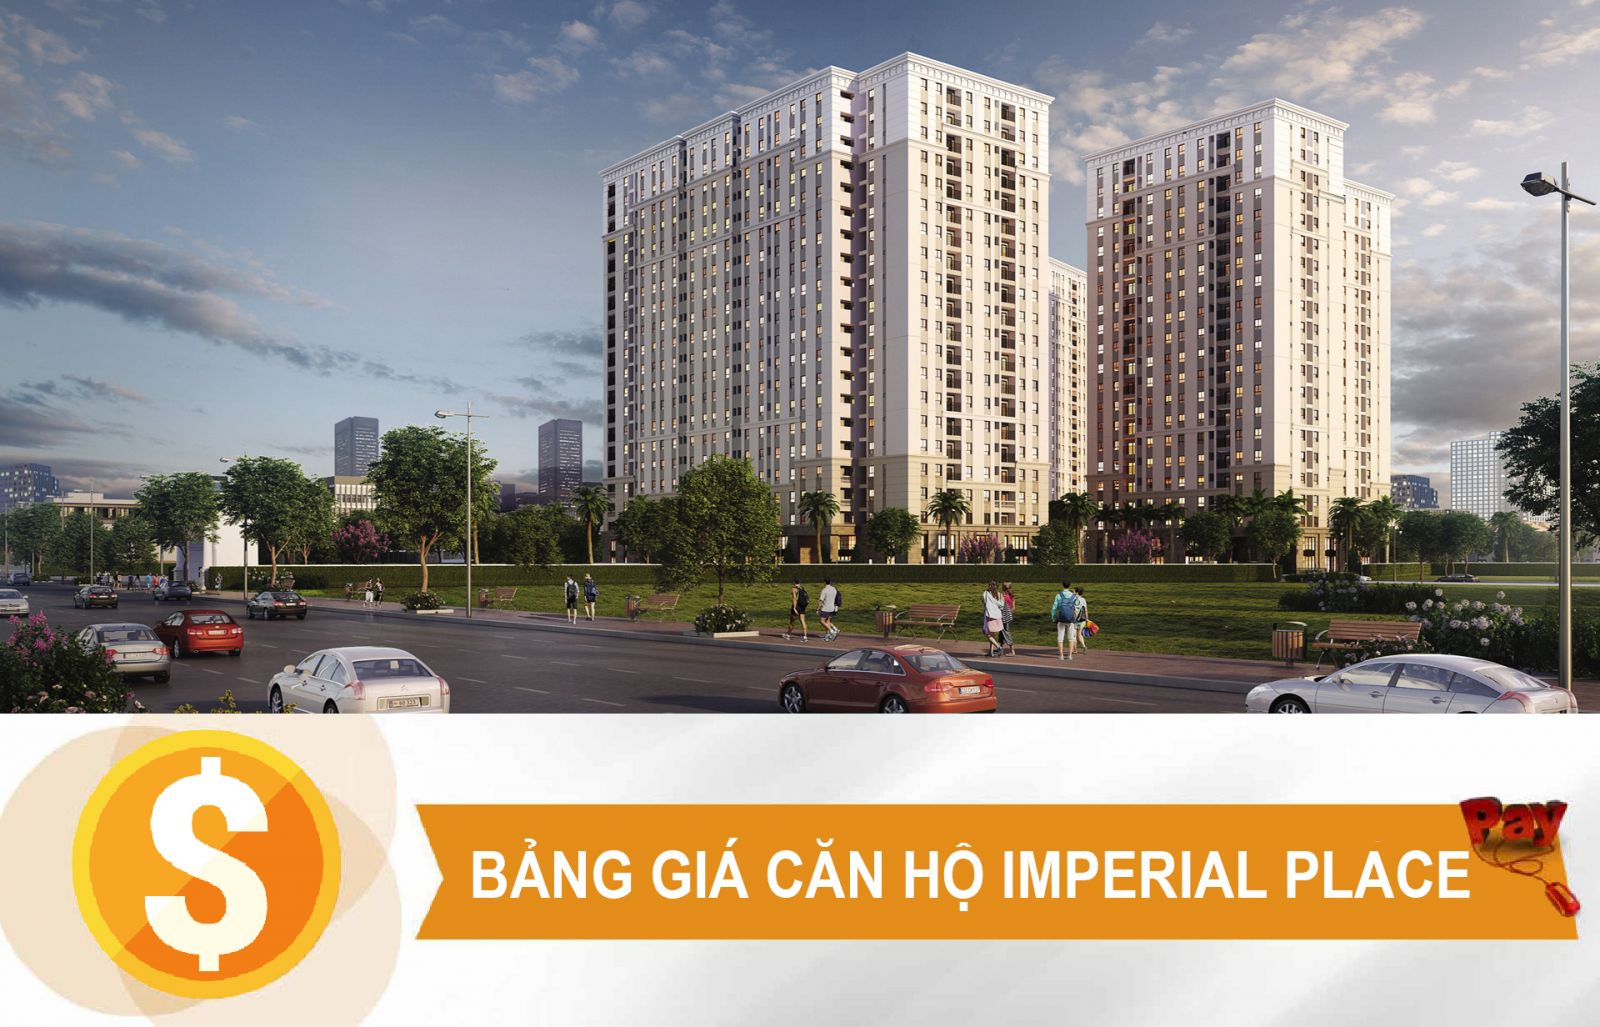 bảng giá căn hộ imperial place